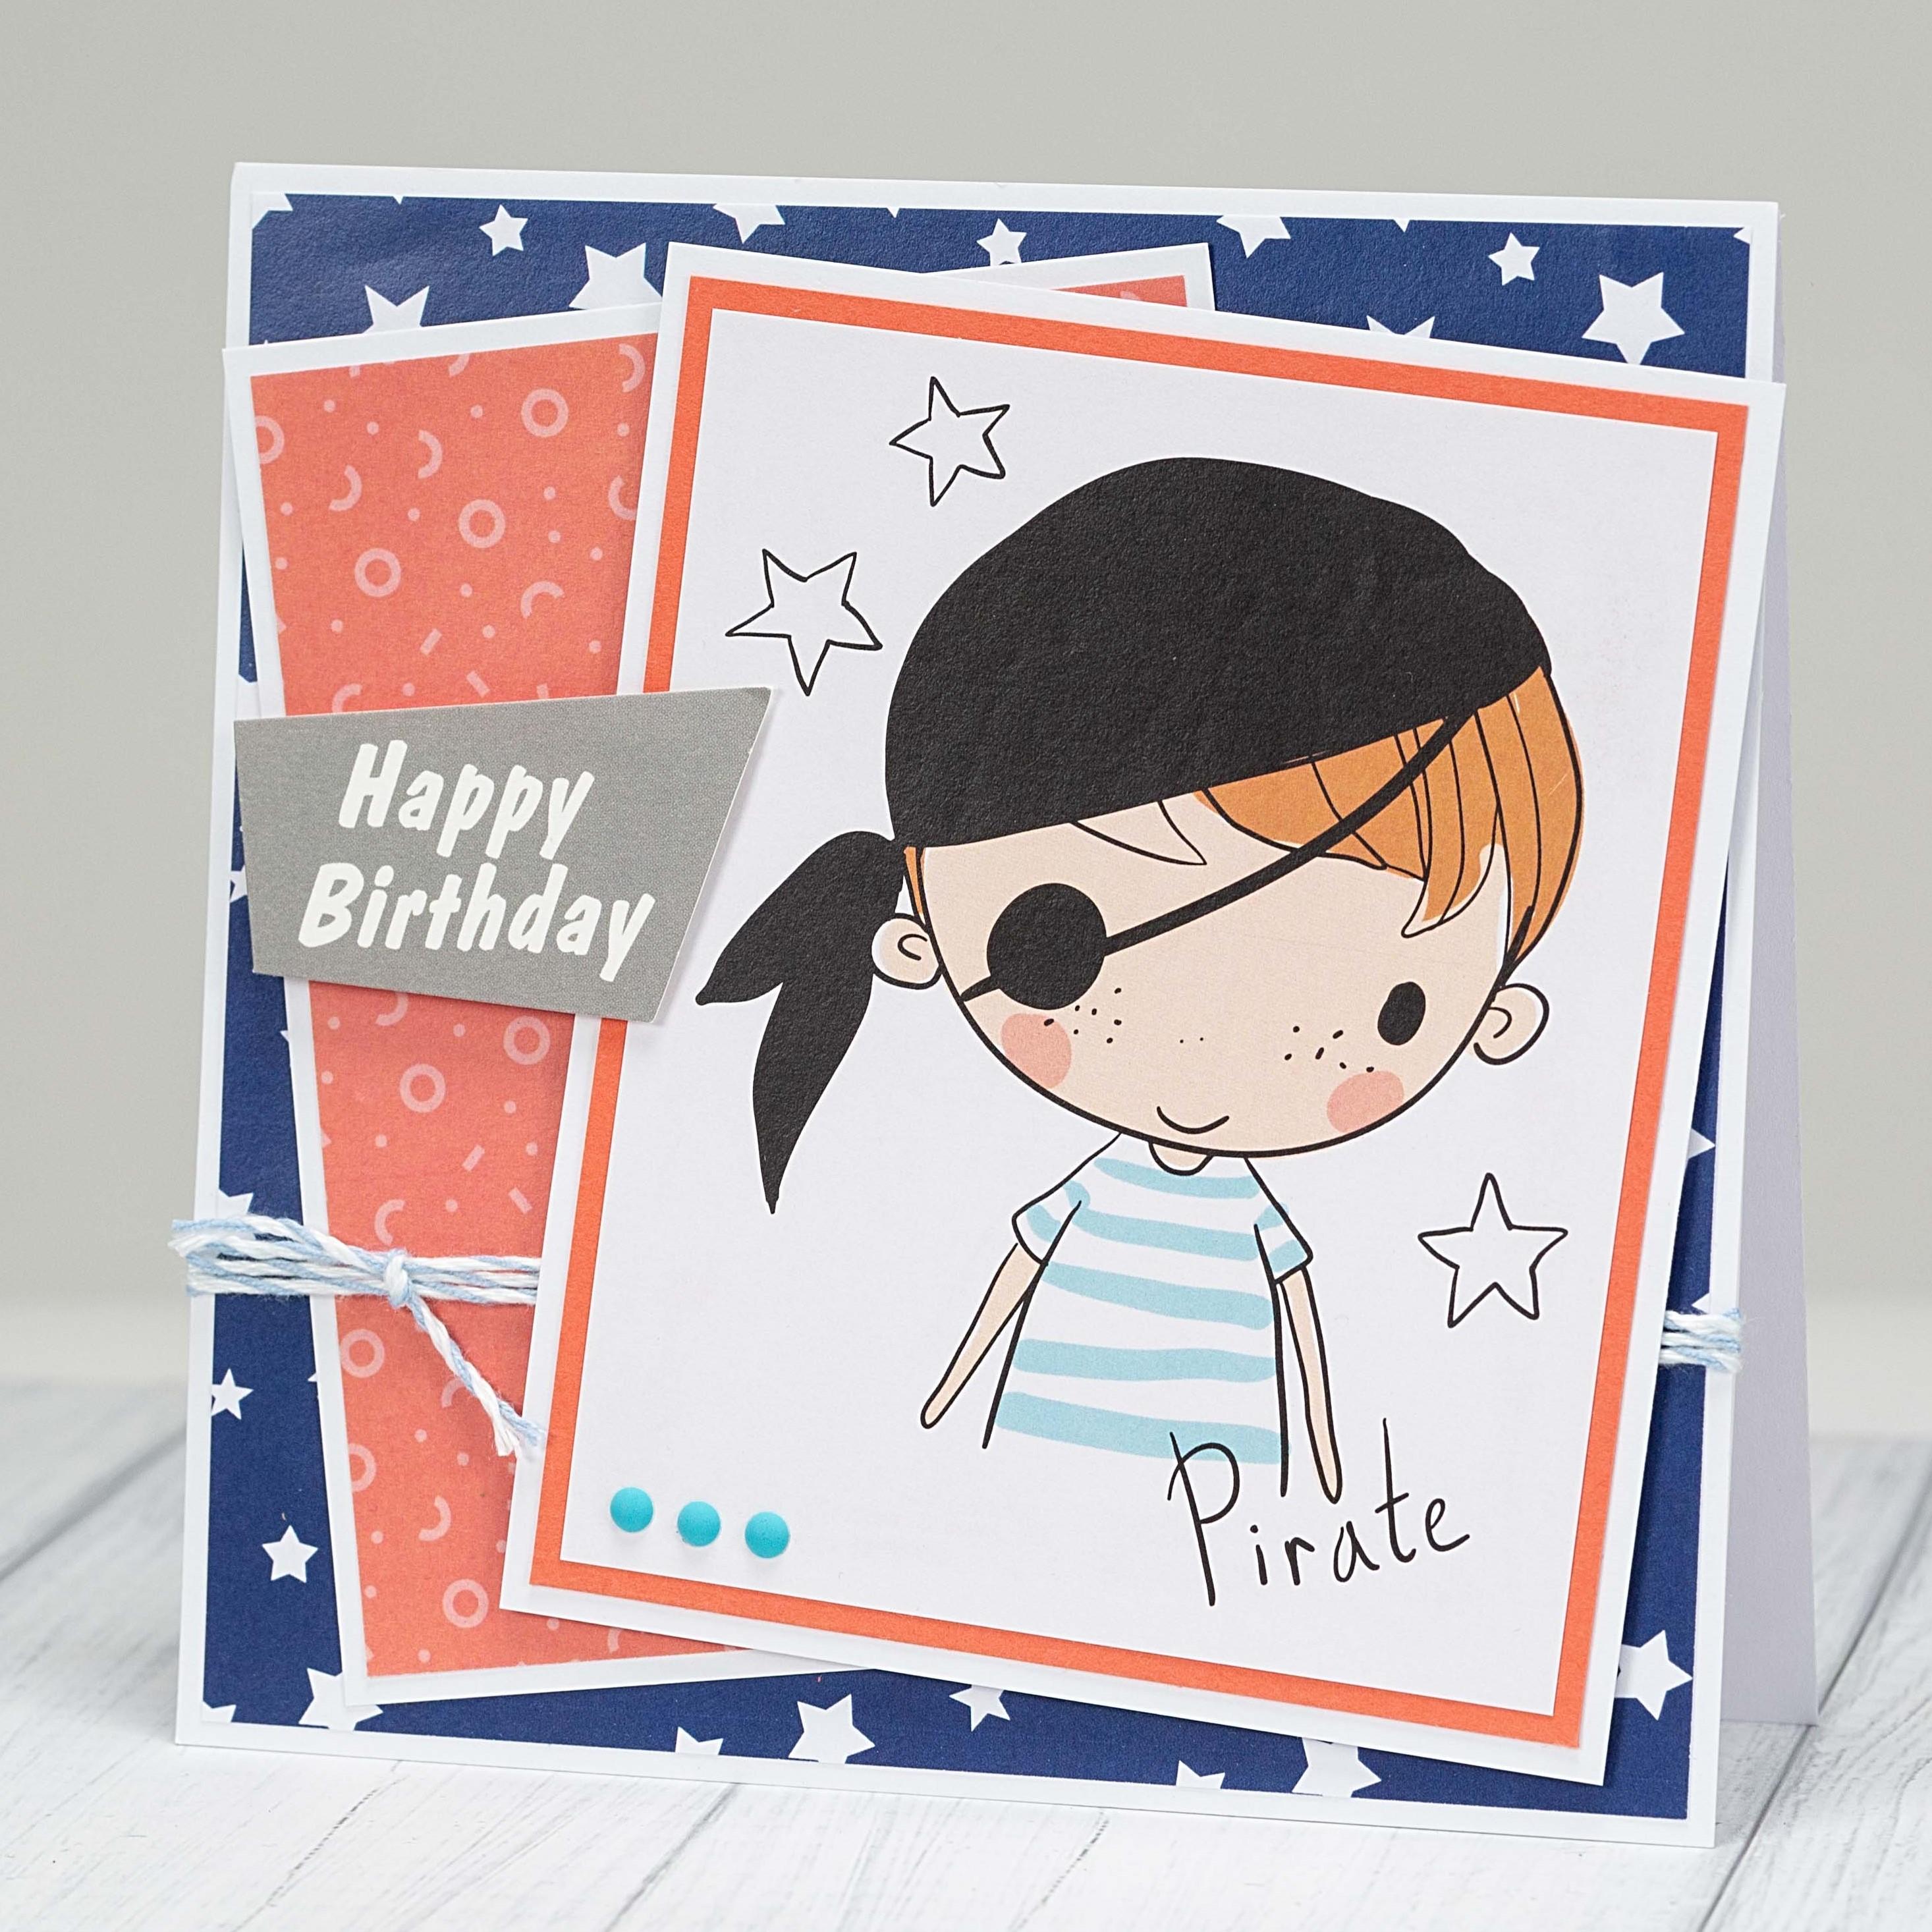 Homemade birthday cards for boys